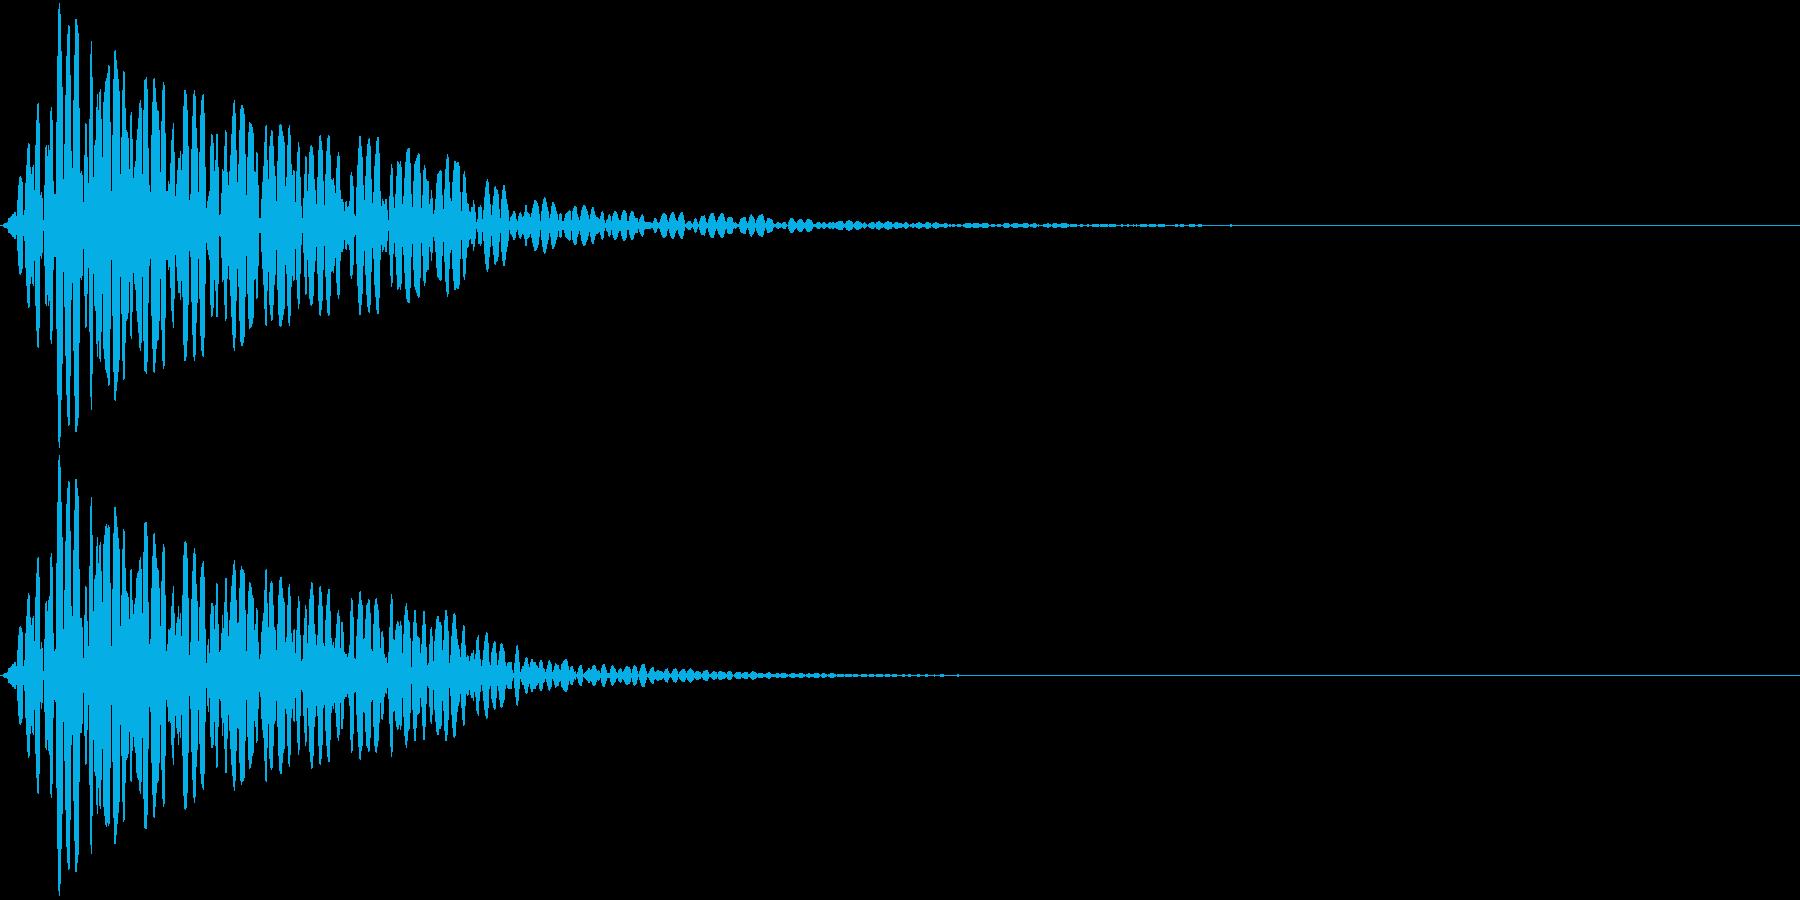 App 警告音 エラー音 ブッ!の再生済みの波形